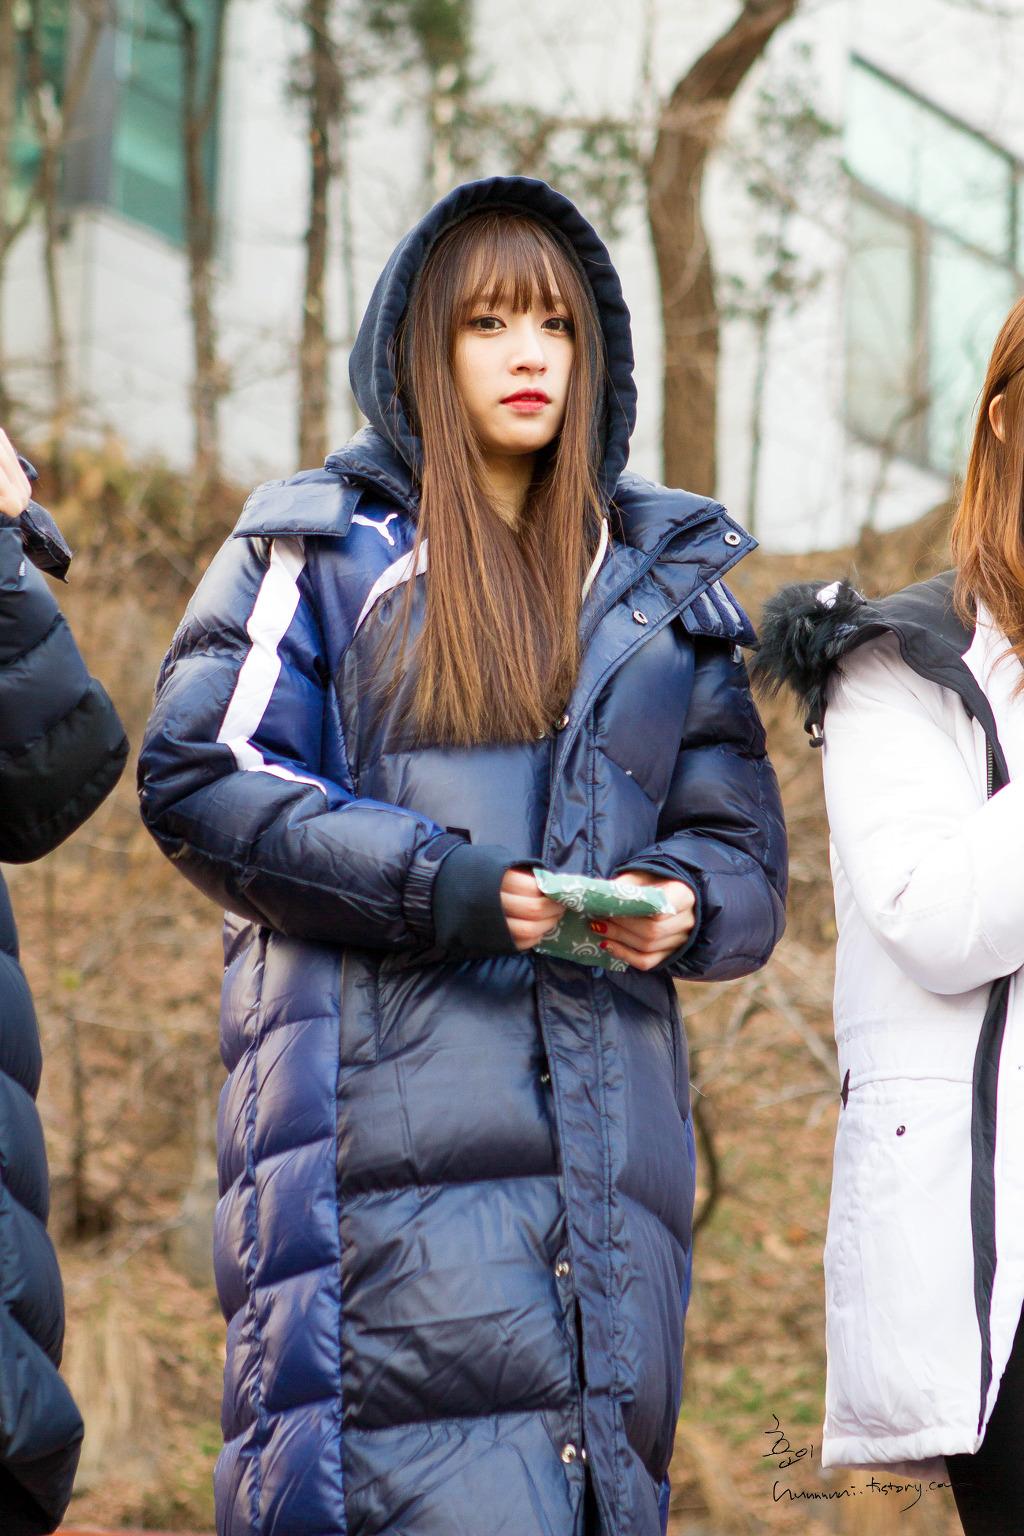 [HQ/FANTAKEN] 14.12.07 EXID's Fan Meeting after Inkigayo Byhunnnnni